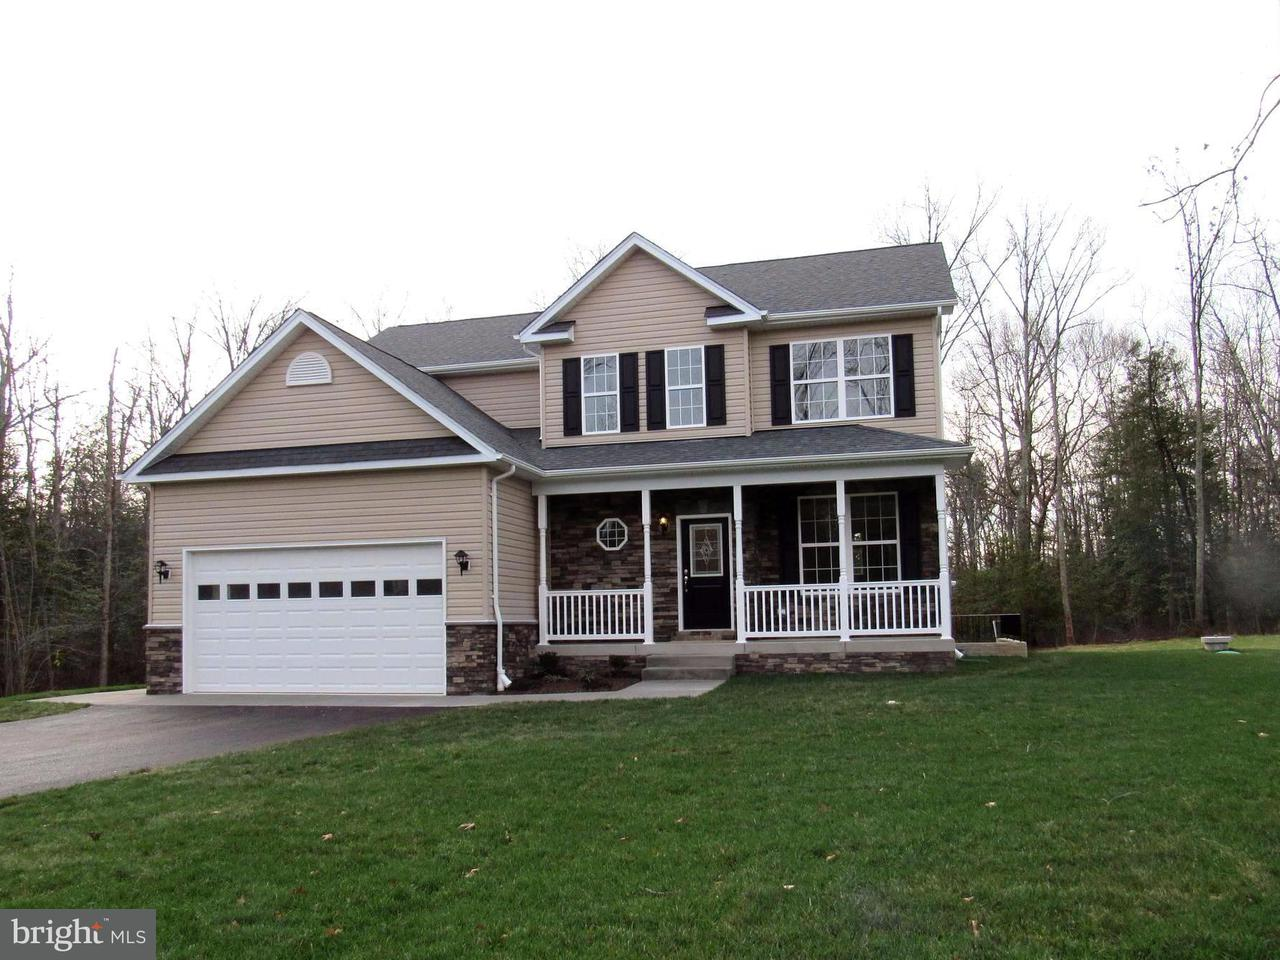 Casa Unifamiliar por un Venta en 14110 PUDGES PLACE 14110 PUDGES PLACE Charlotte Hall, Maryland 20622 Estados Unidos